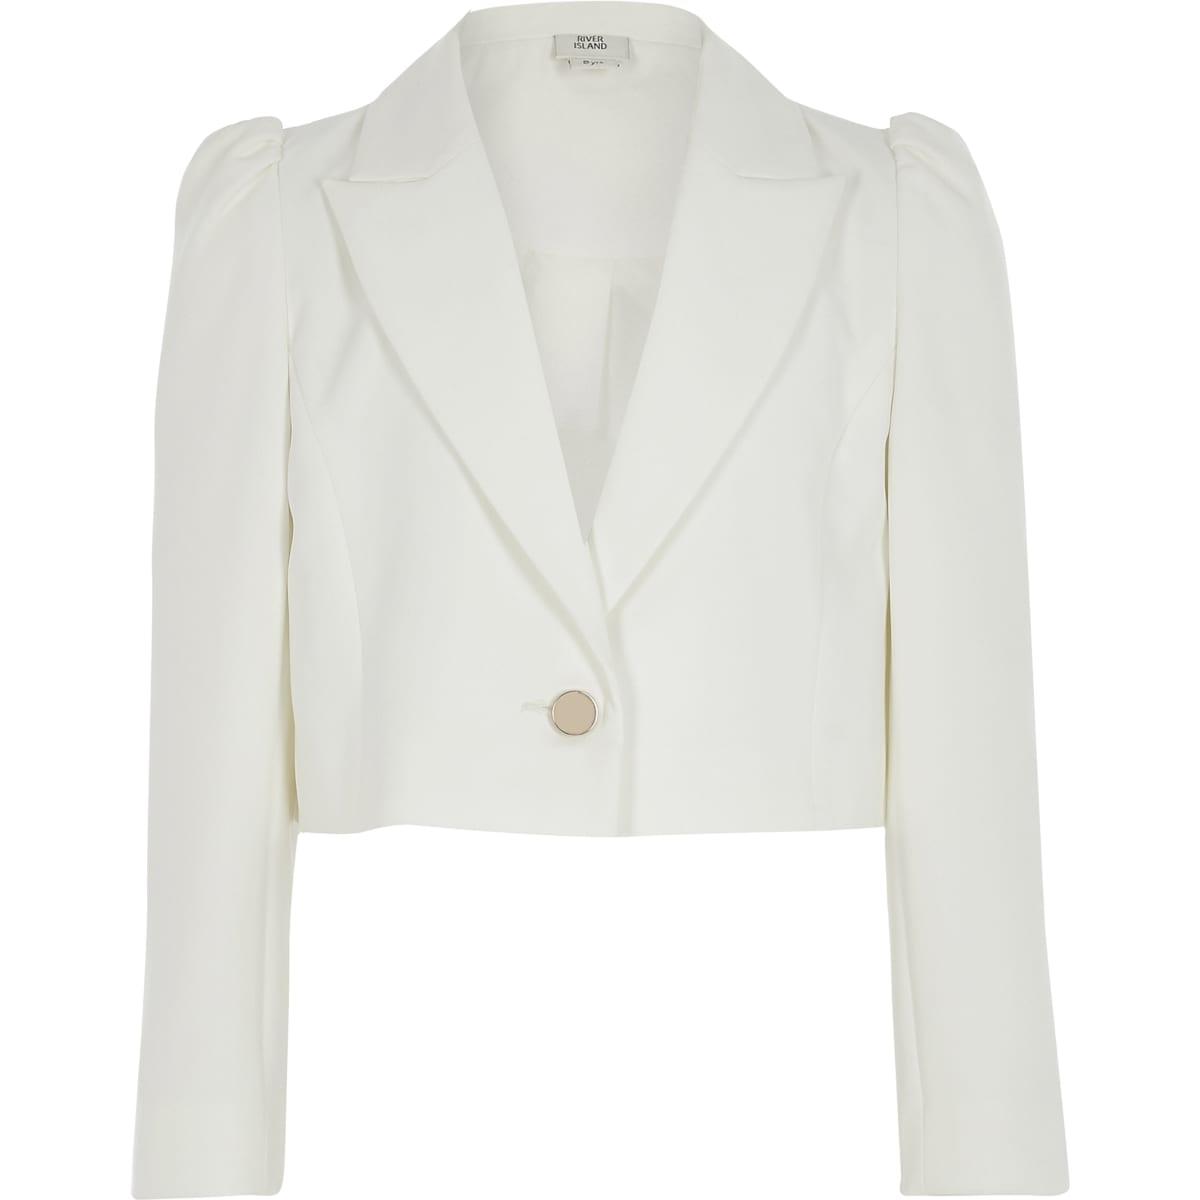 Witte cropped blazer met pofmouwen voor meisjes